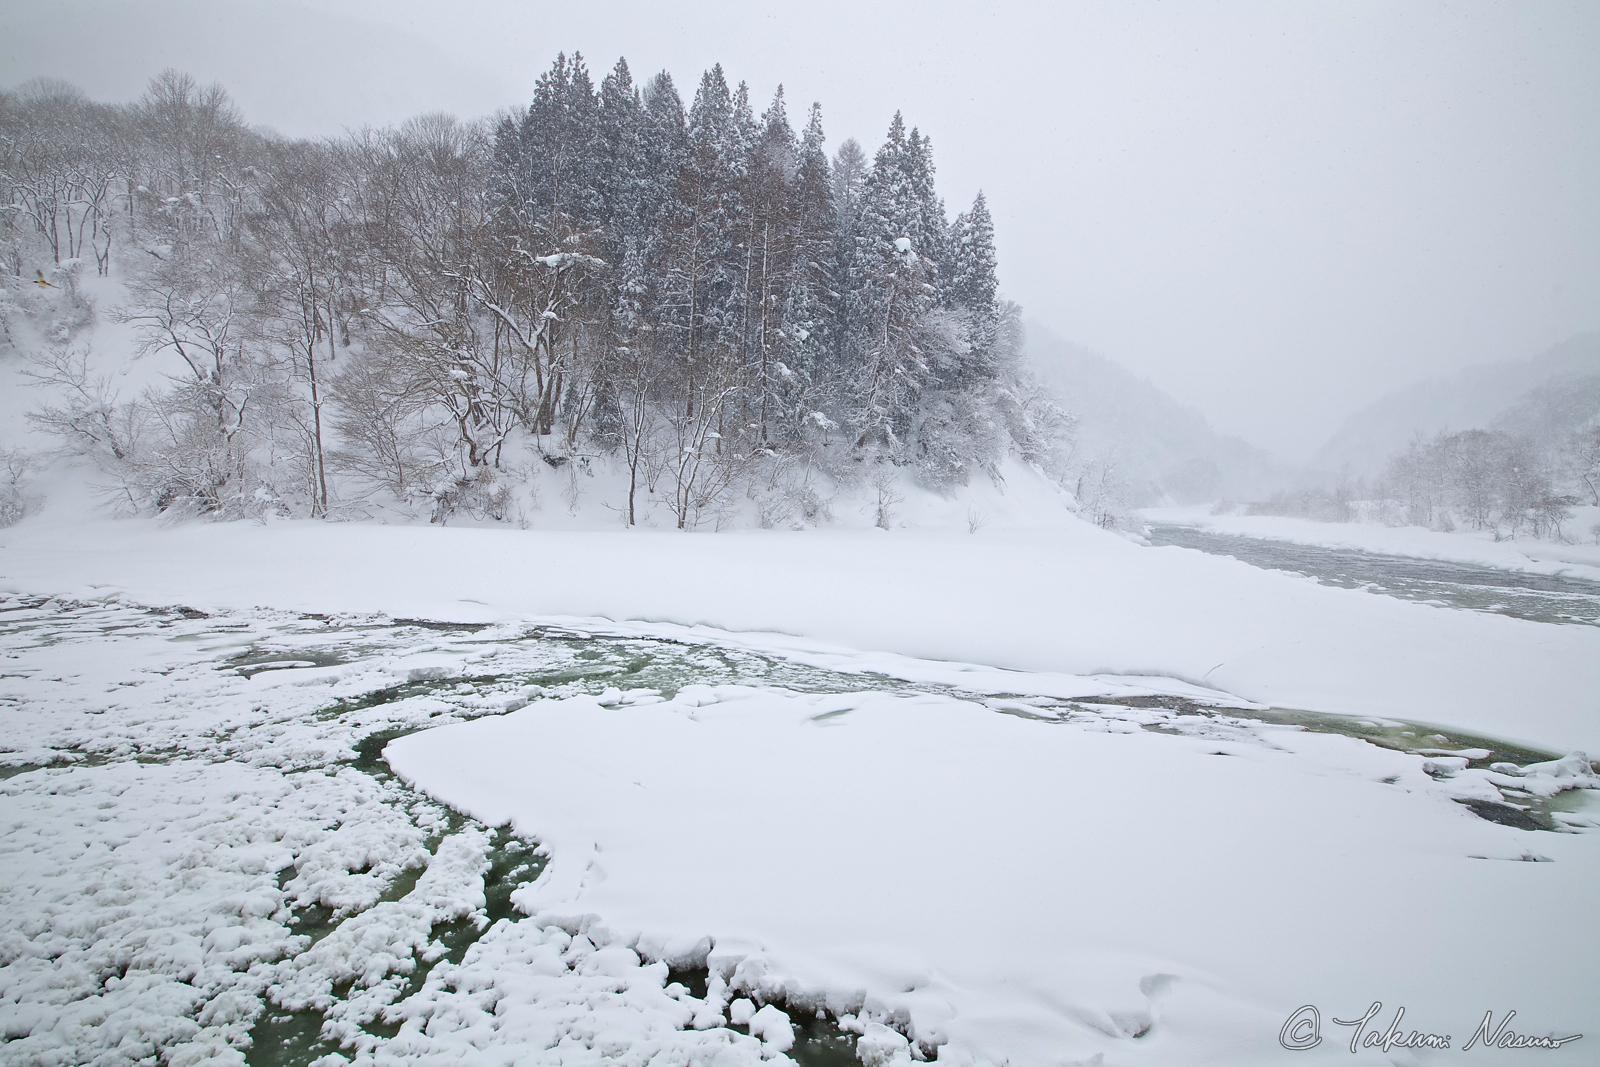 Otari Village - Hime River